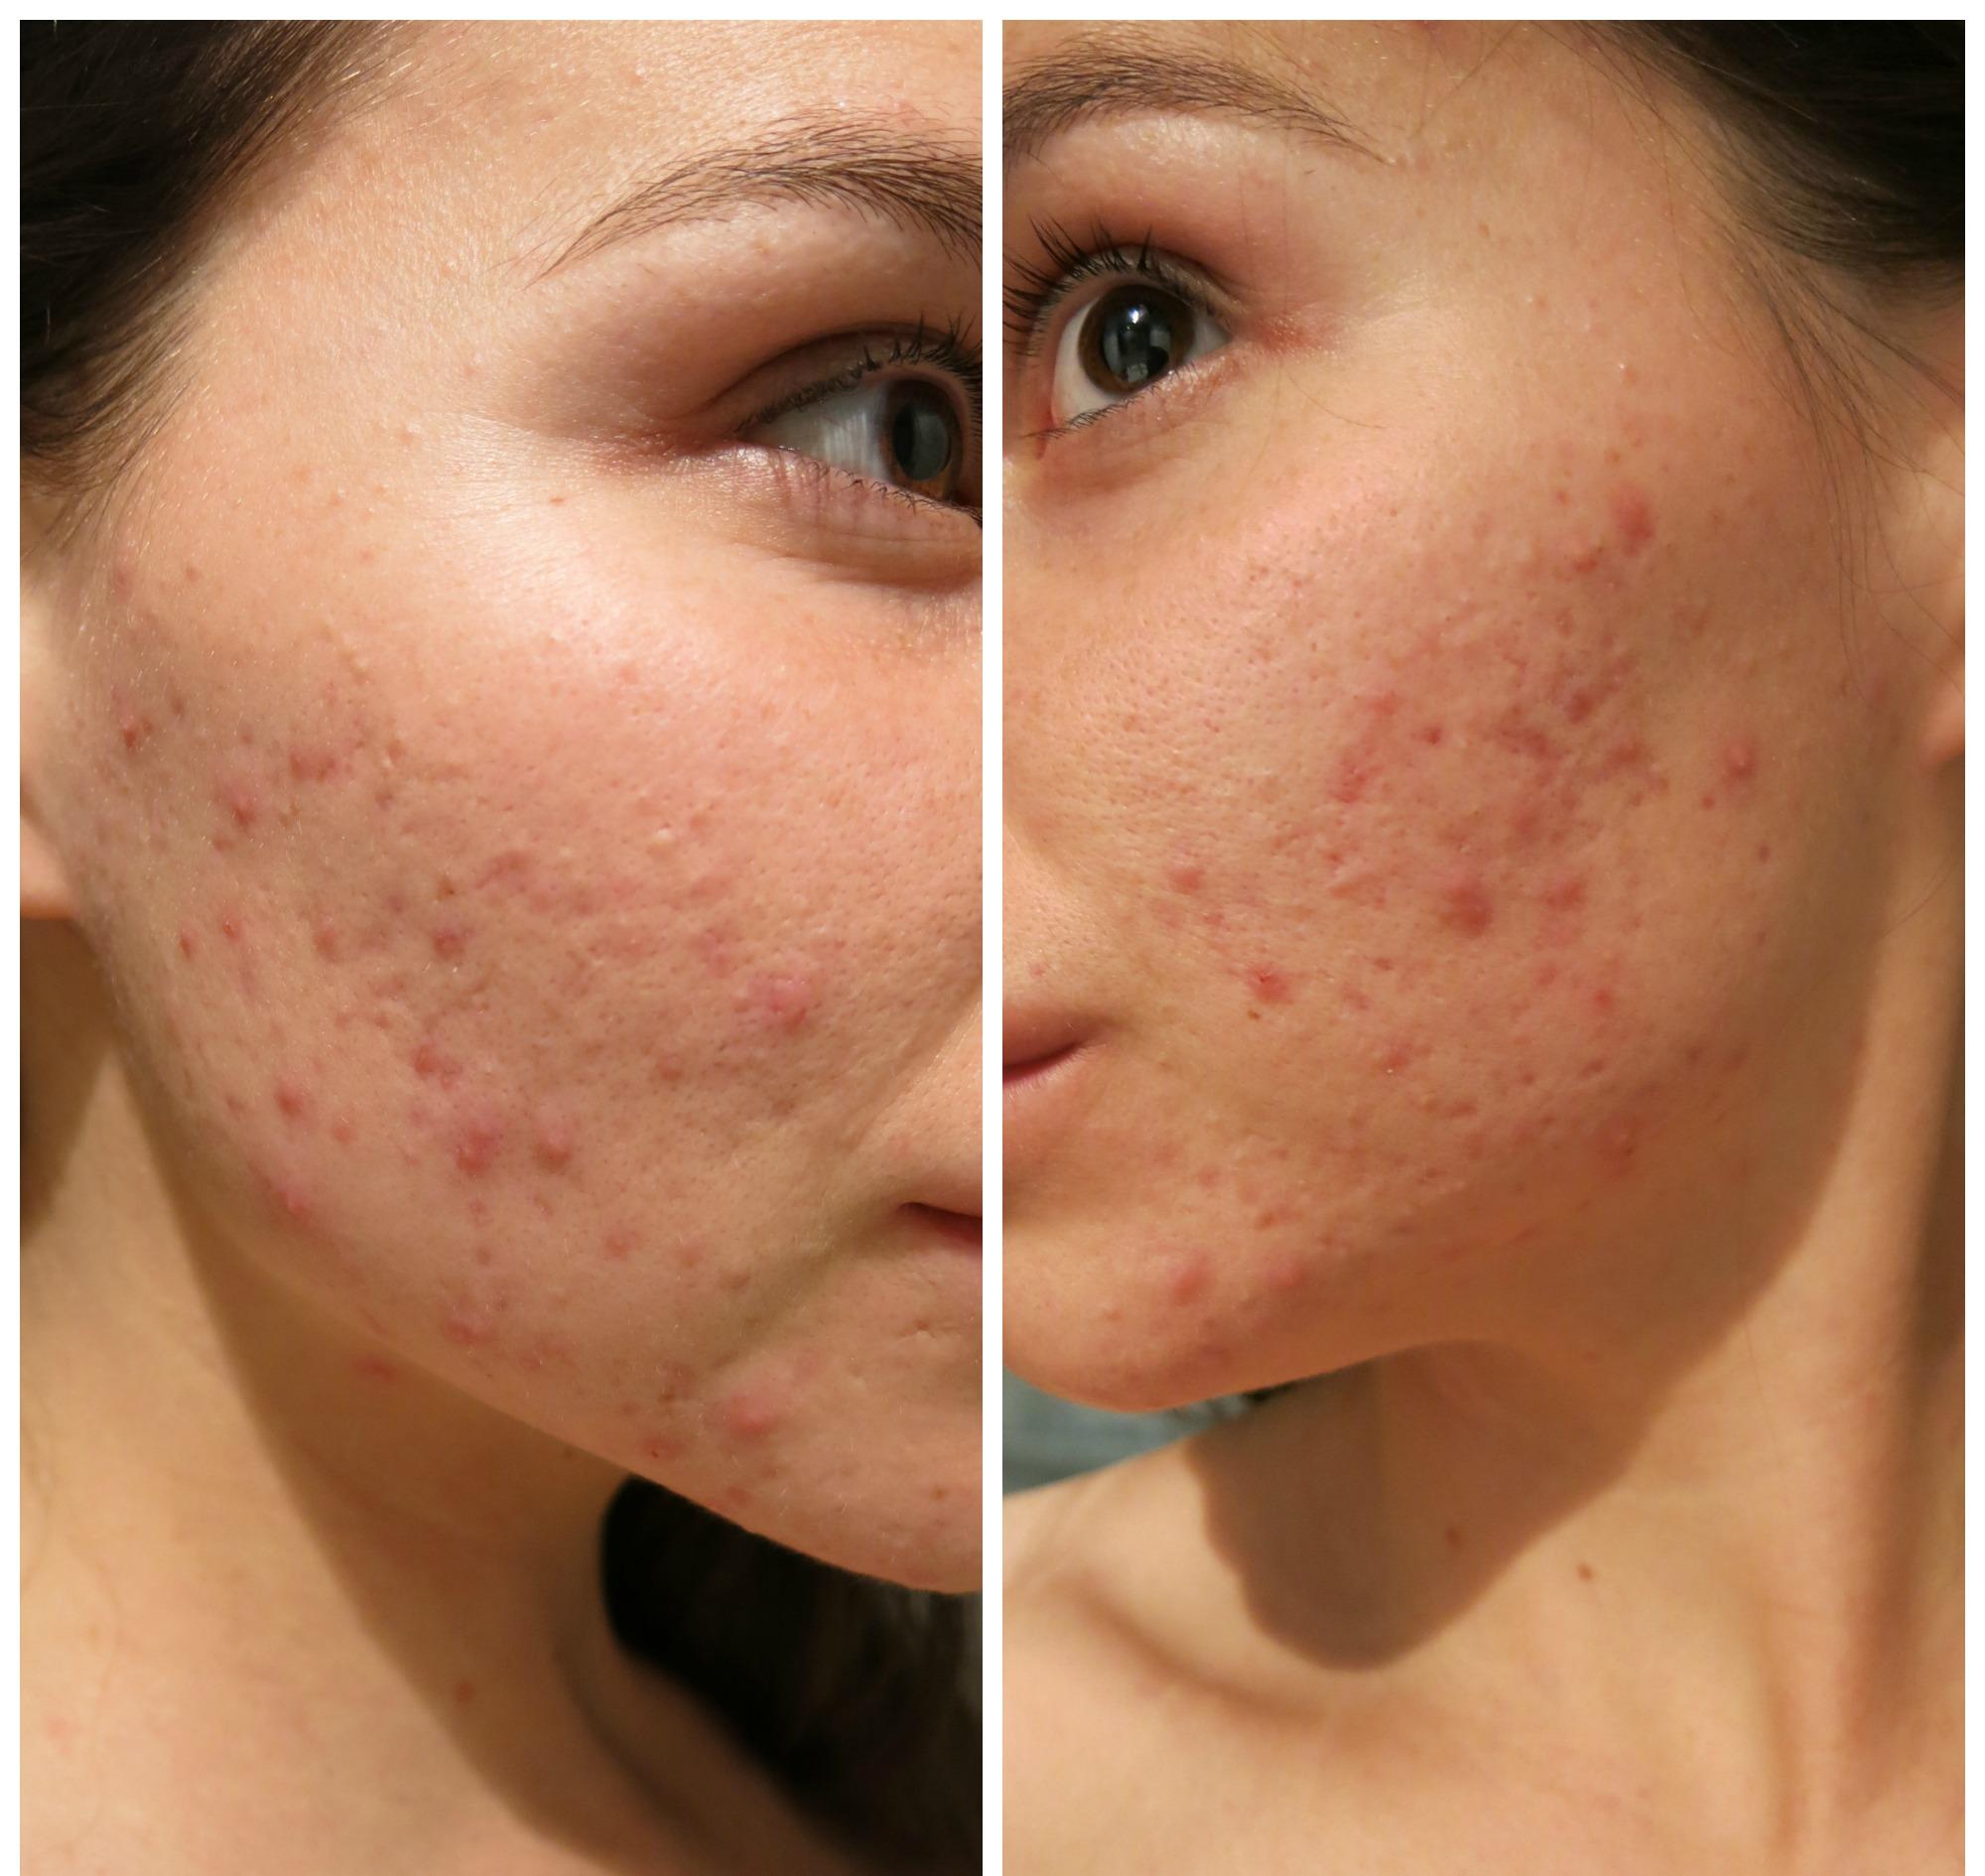 acne på kinderna